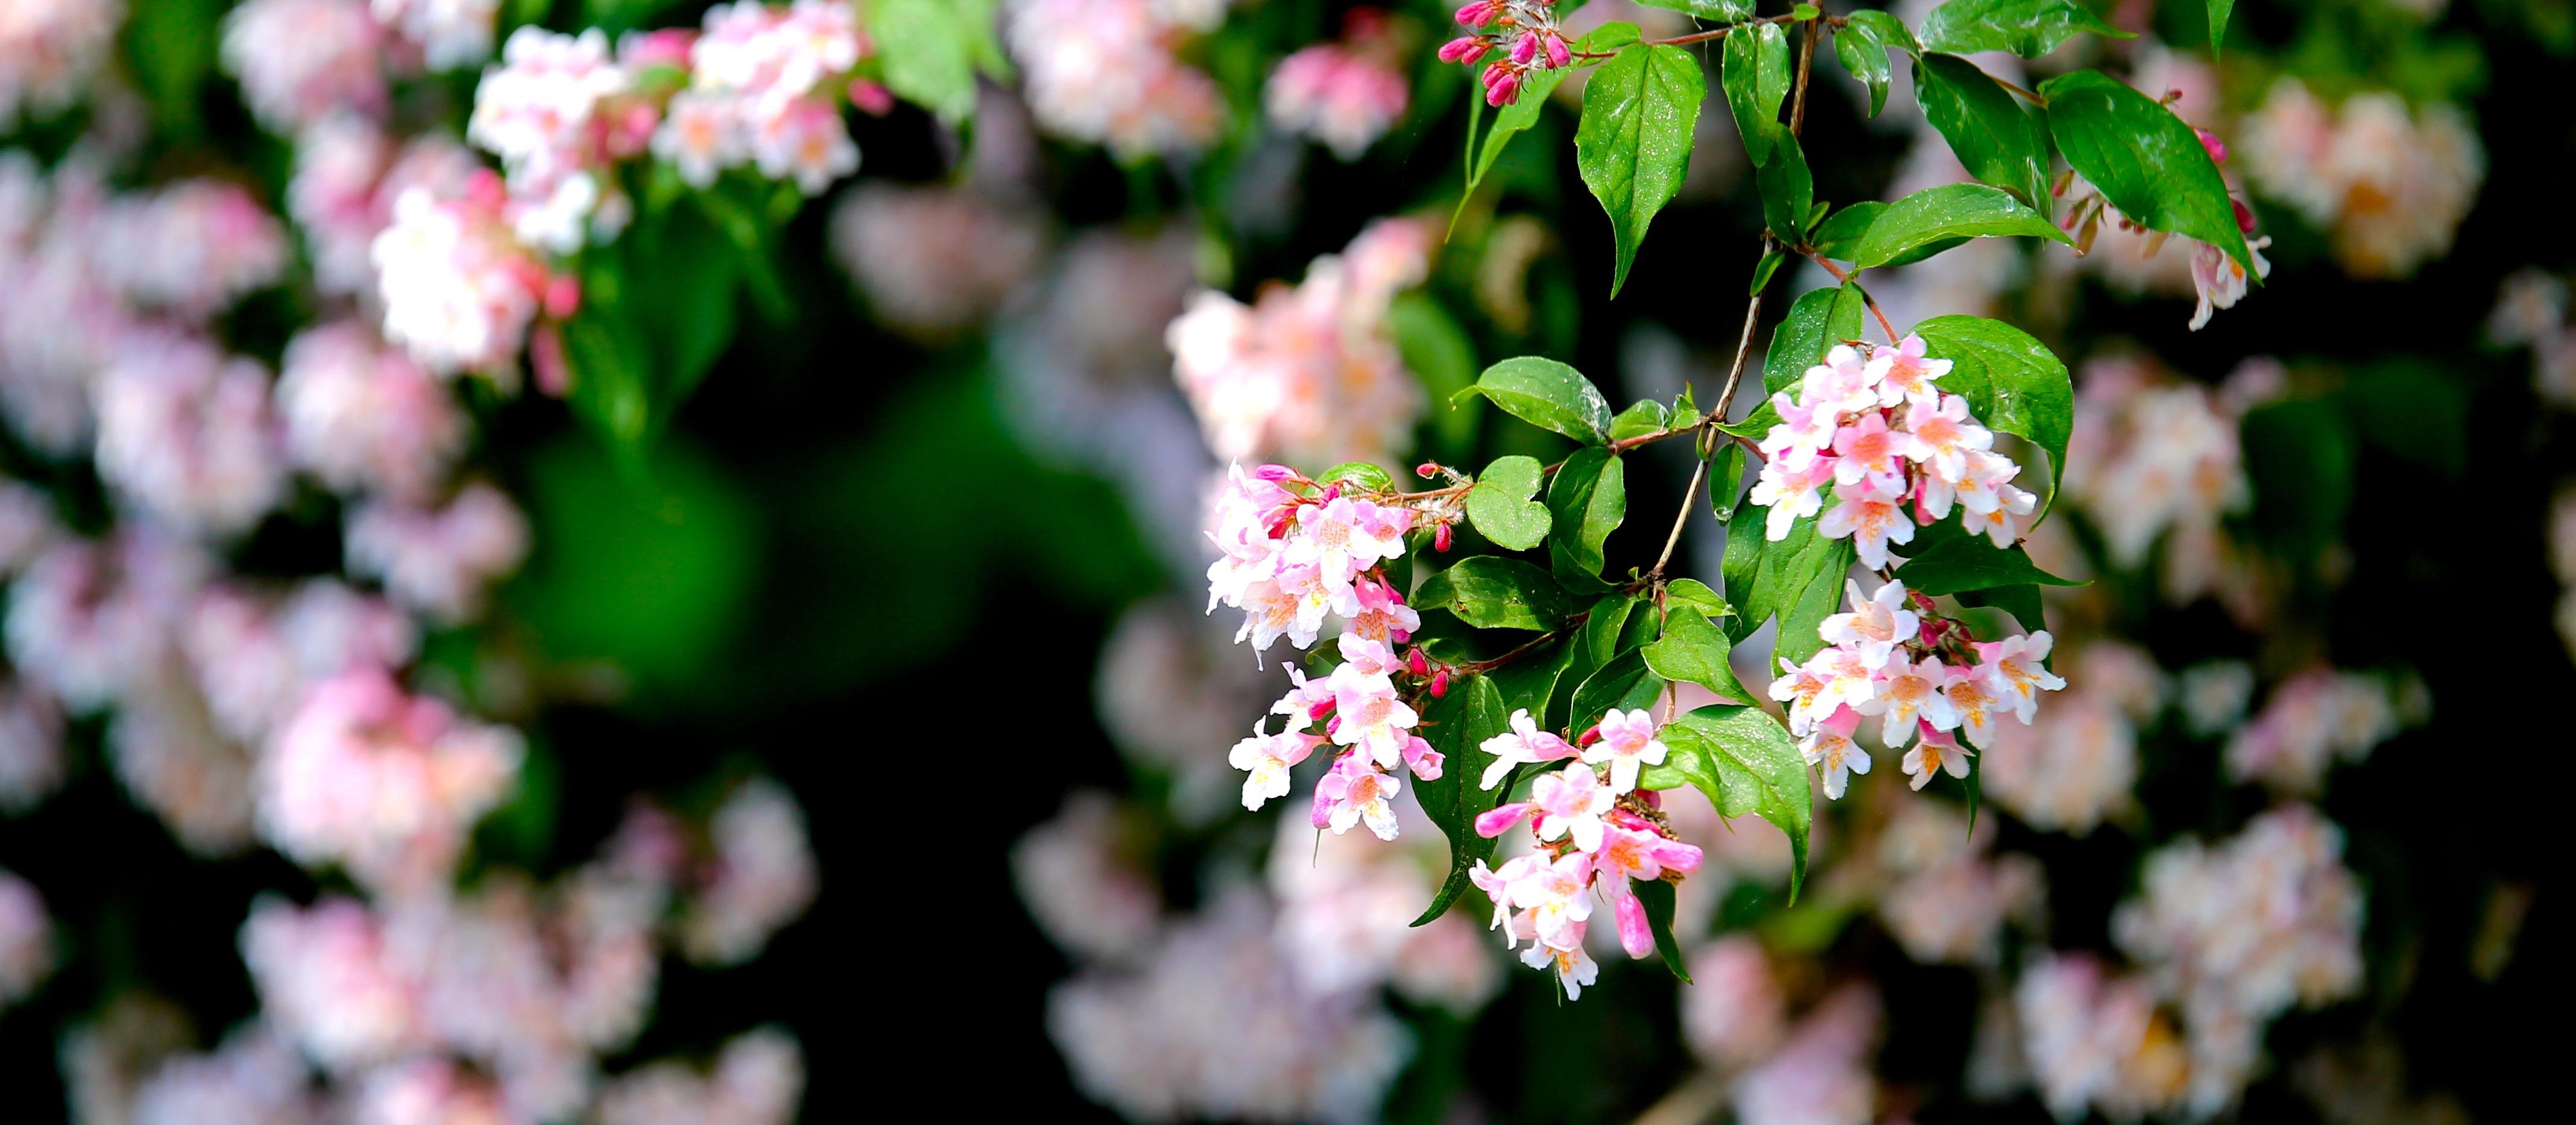 flower-flowers-nature-macro-83129.jpeg (4272×1865)